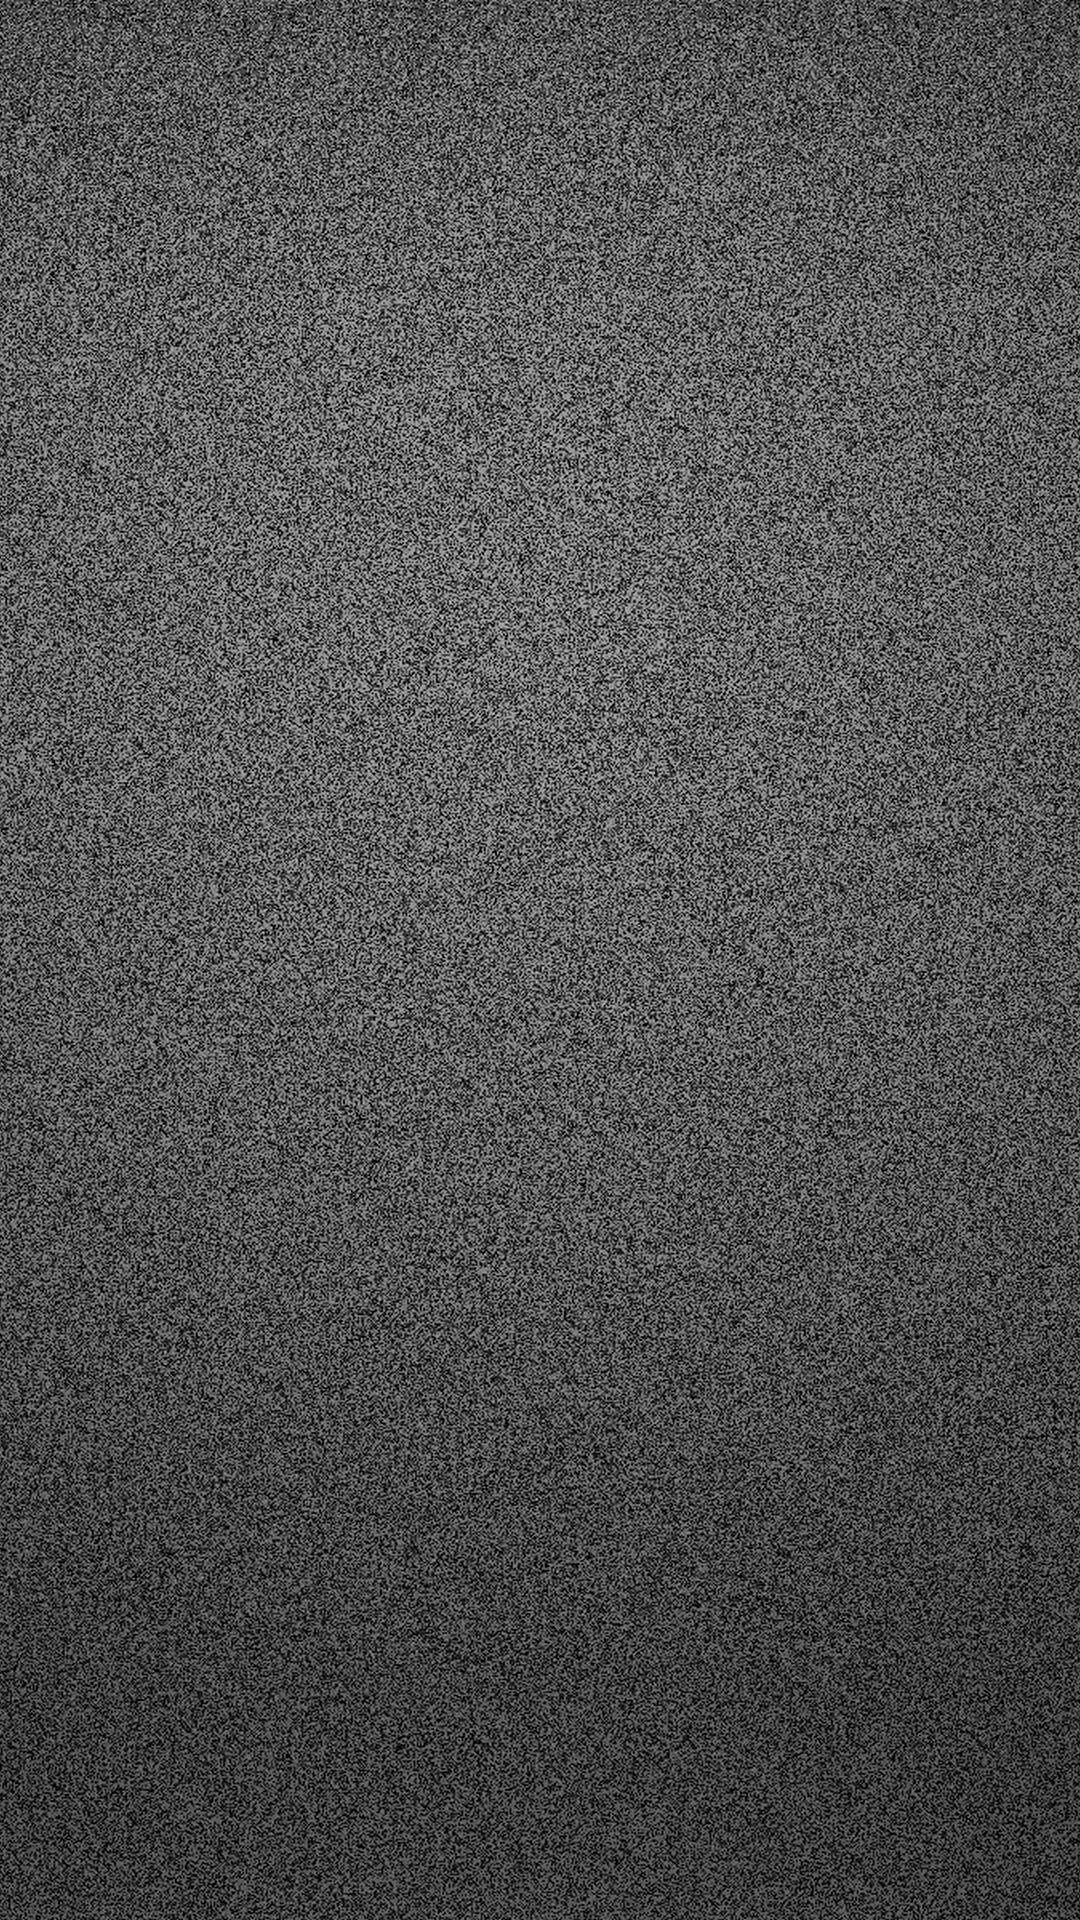 IPhone 6 Plus Wallpaper Dark Pattern 05